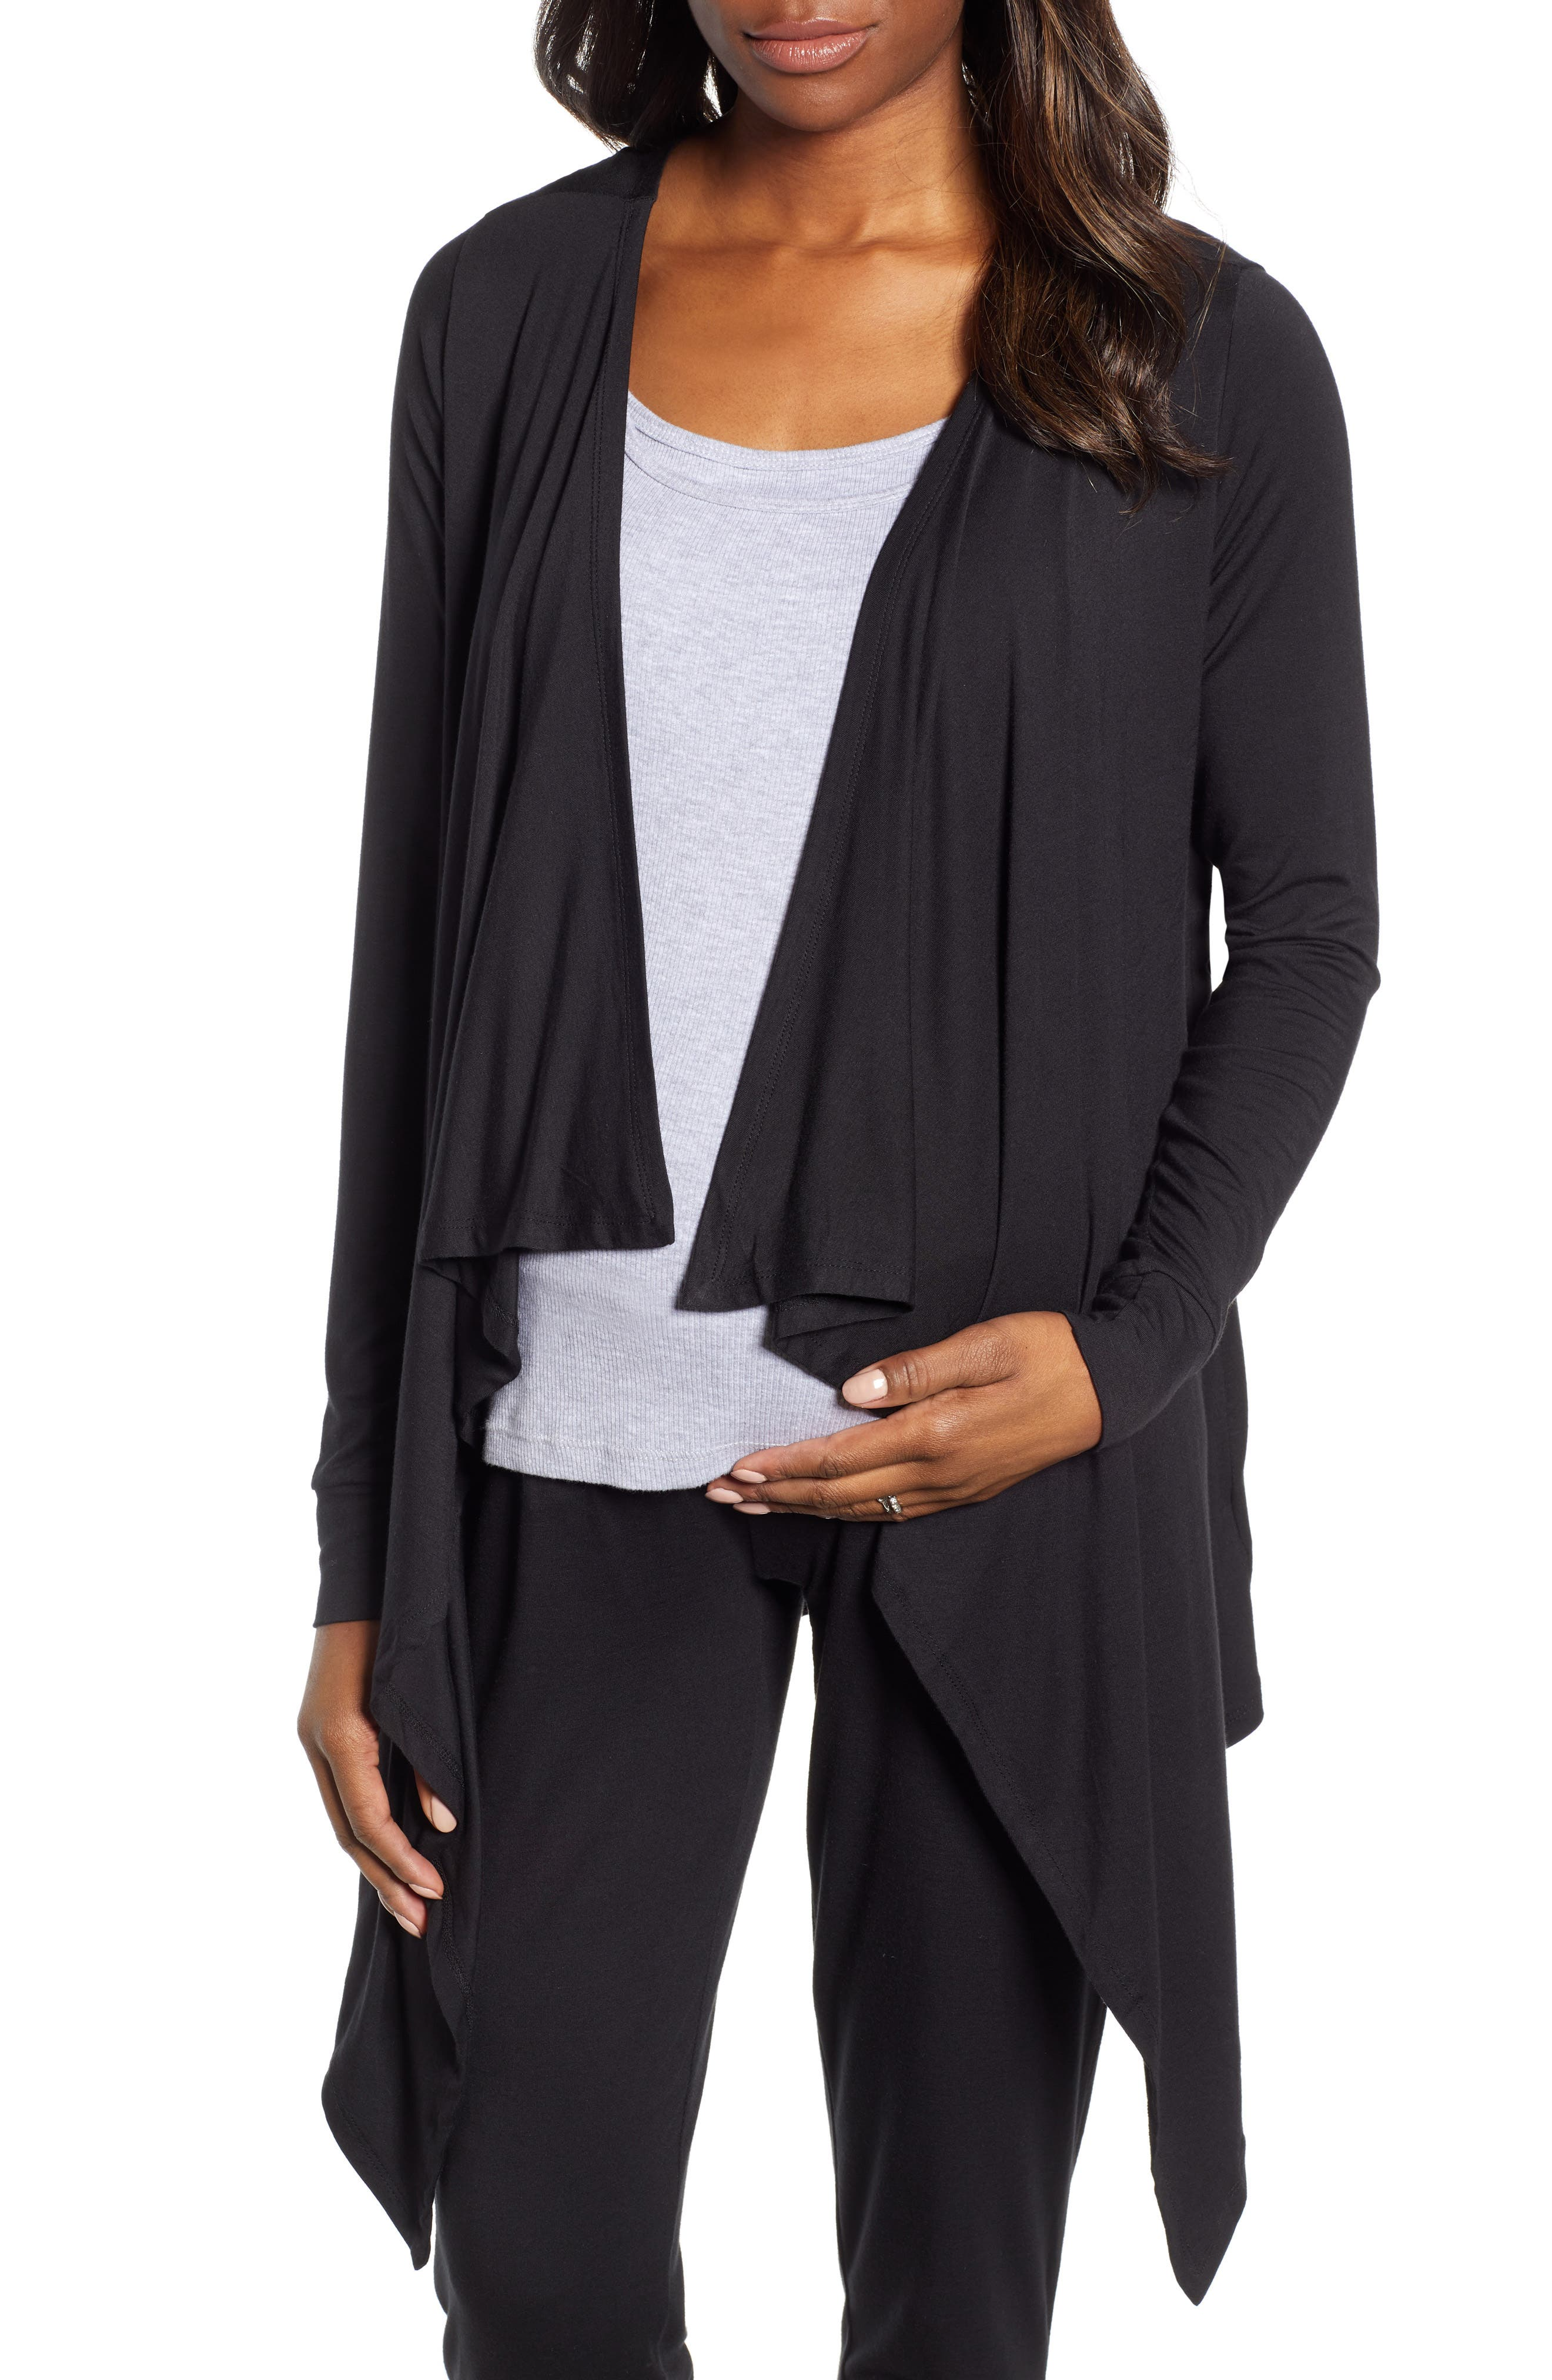 ANGEL MATERNITY Maternity/Nursing Cardigan, Tank & Pants Set, Main, color, BLACK